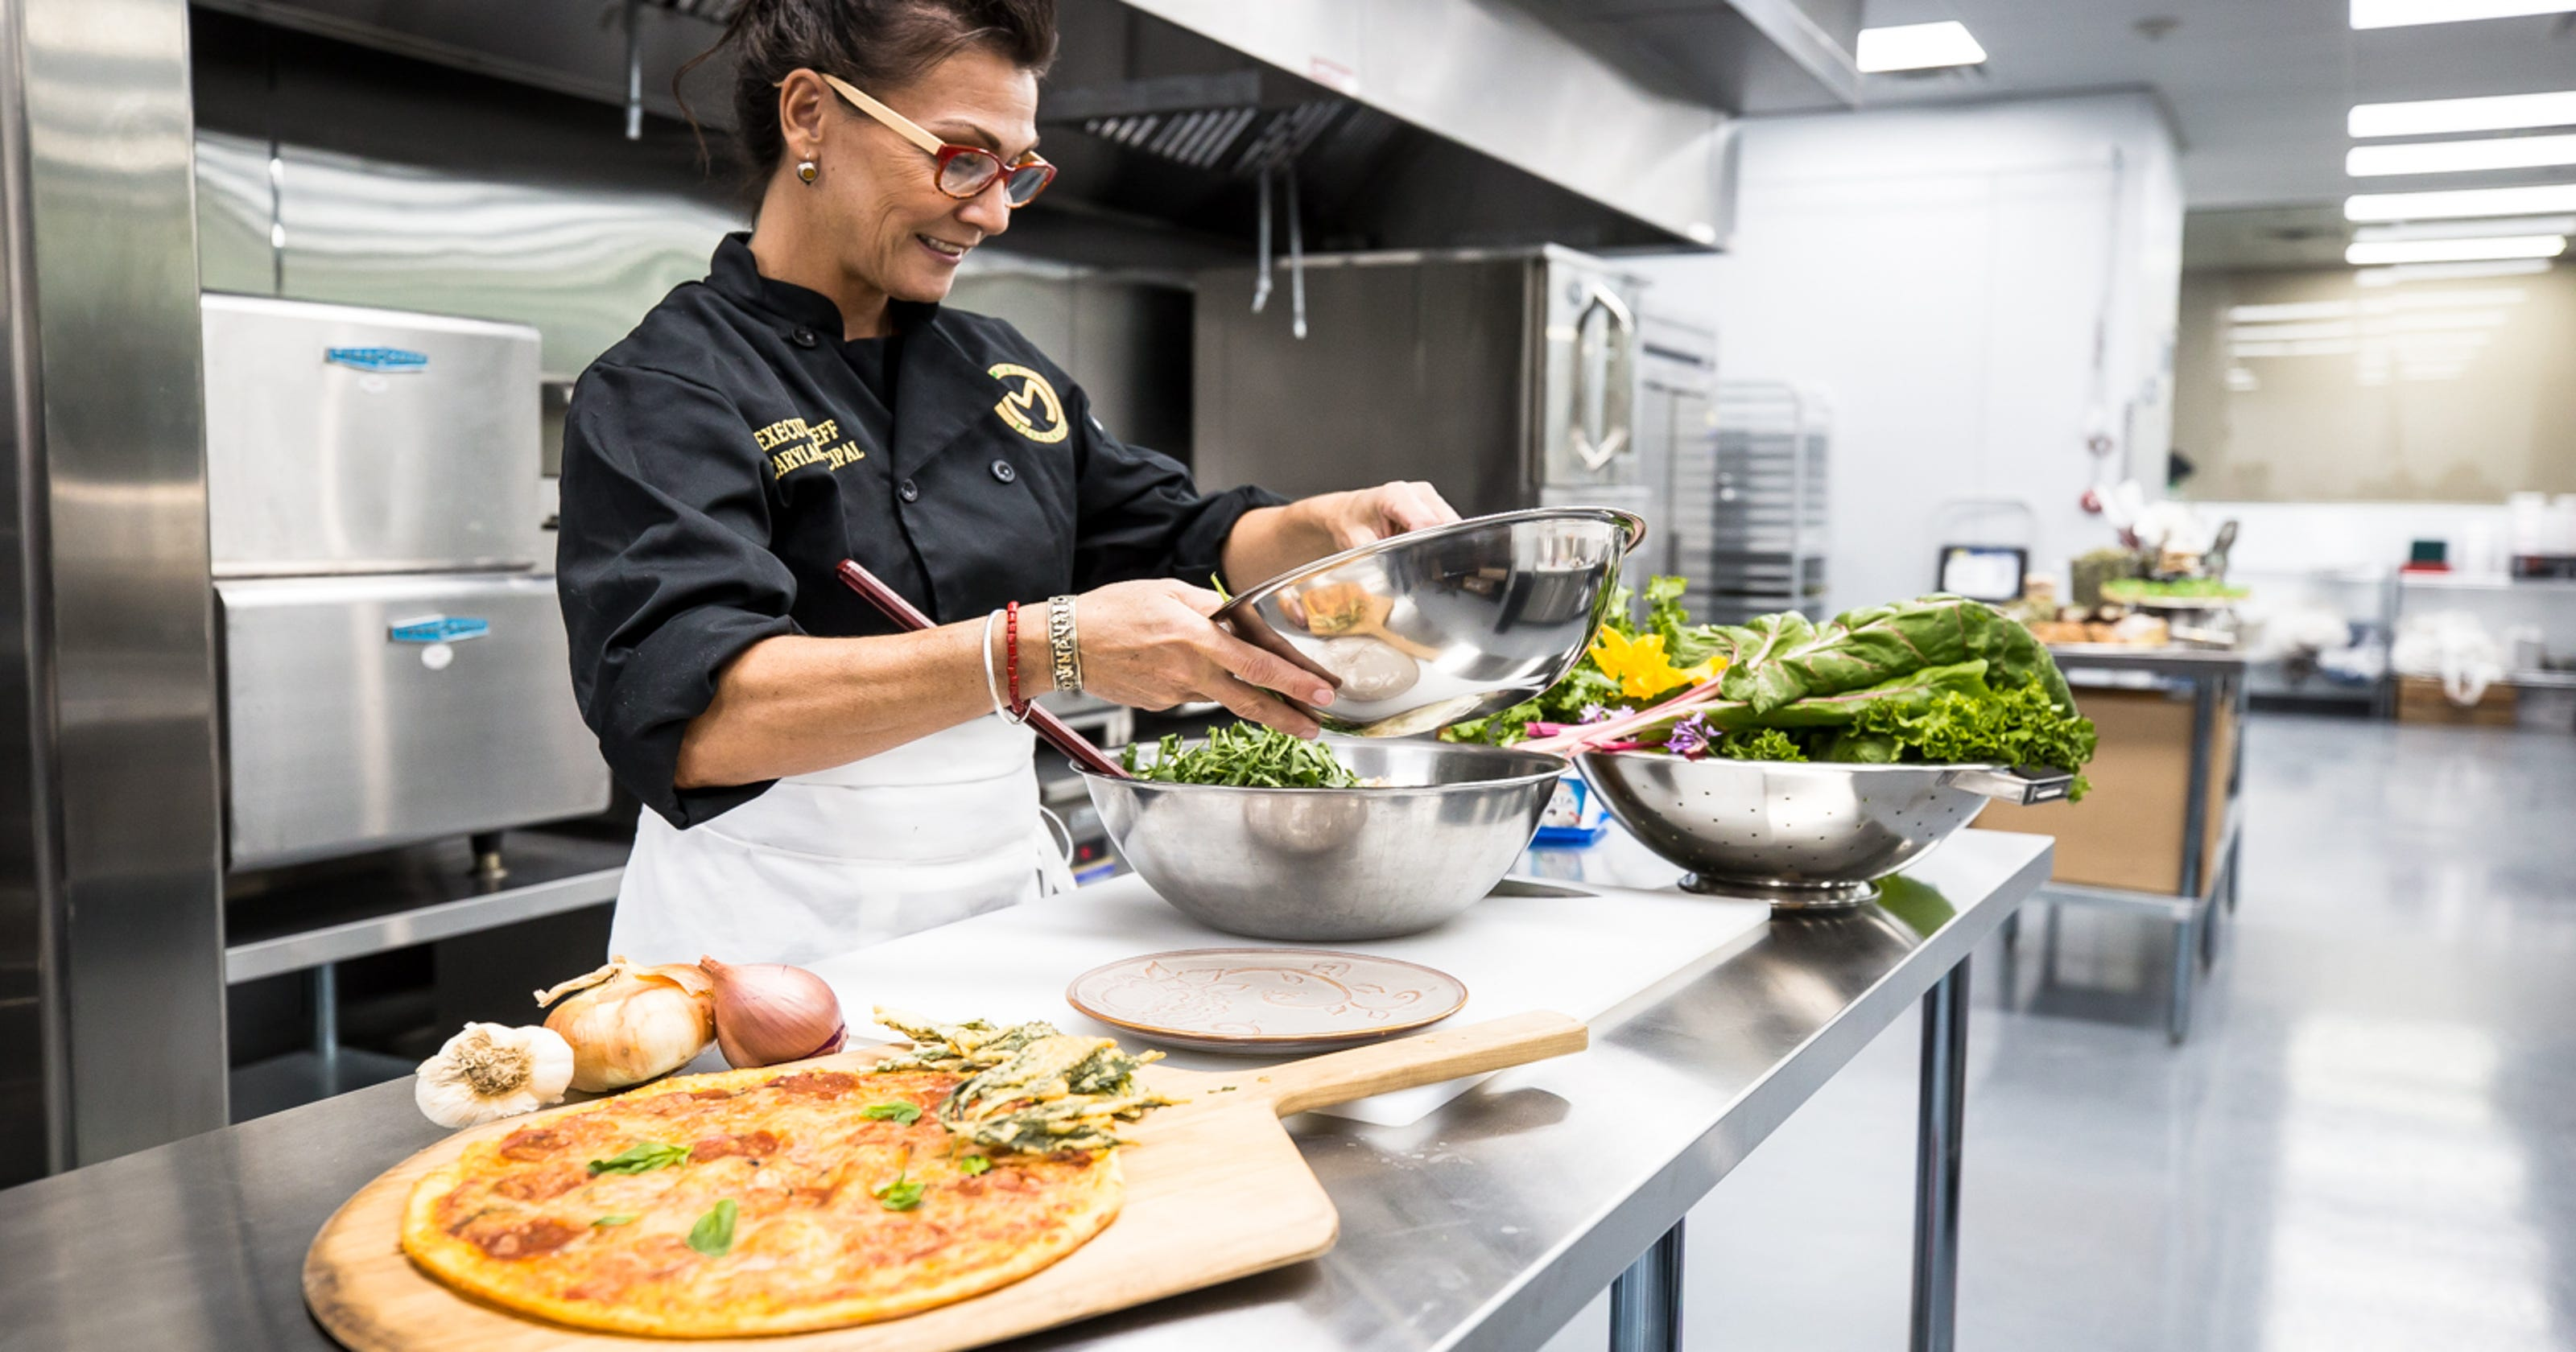 Medical marijuana dispensary opens kitchen opens in Tempe